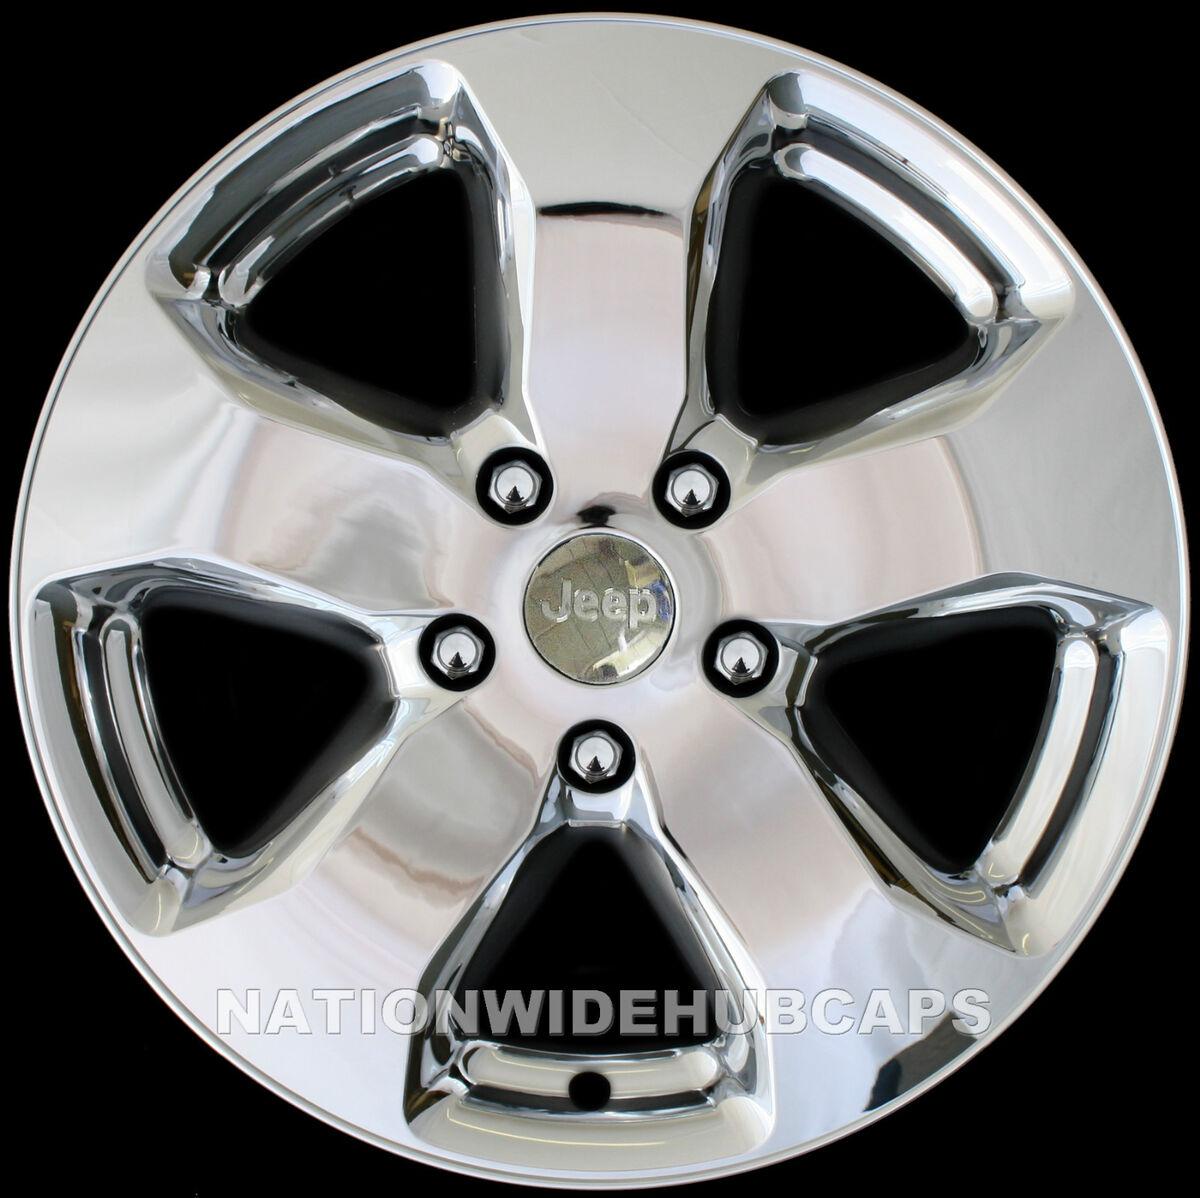 Jeep Grand Cherokee 18 Chrome Wheel Skins Cap Covers Fit 5 Spoke